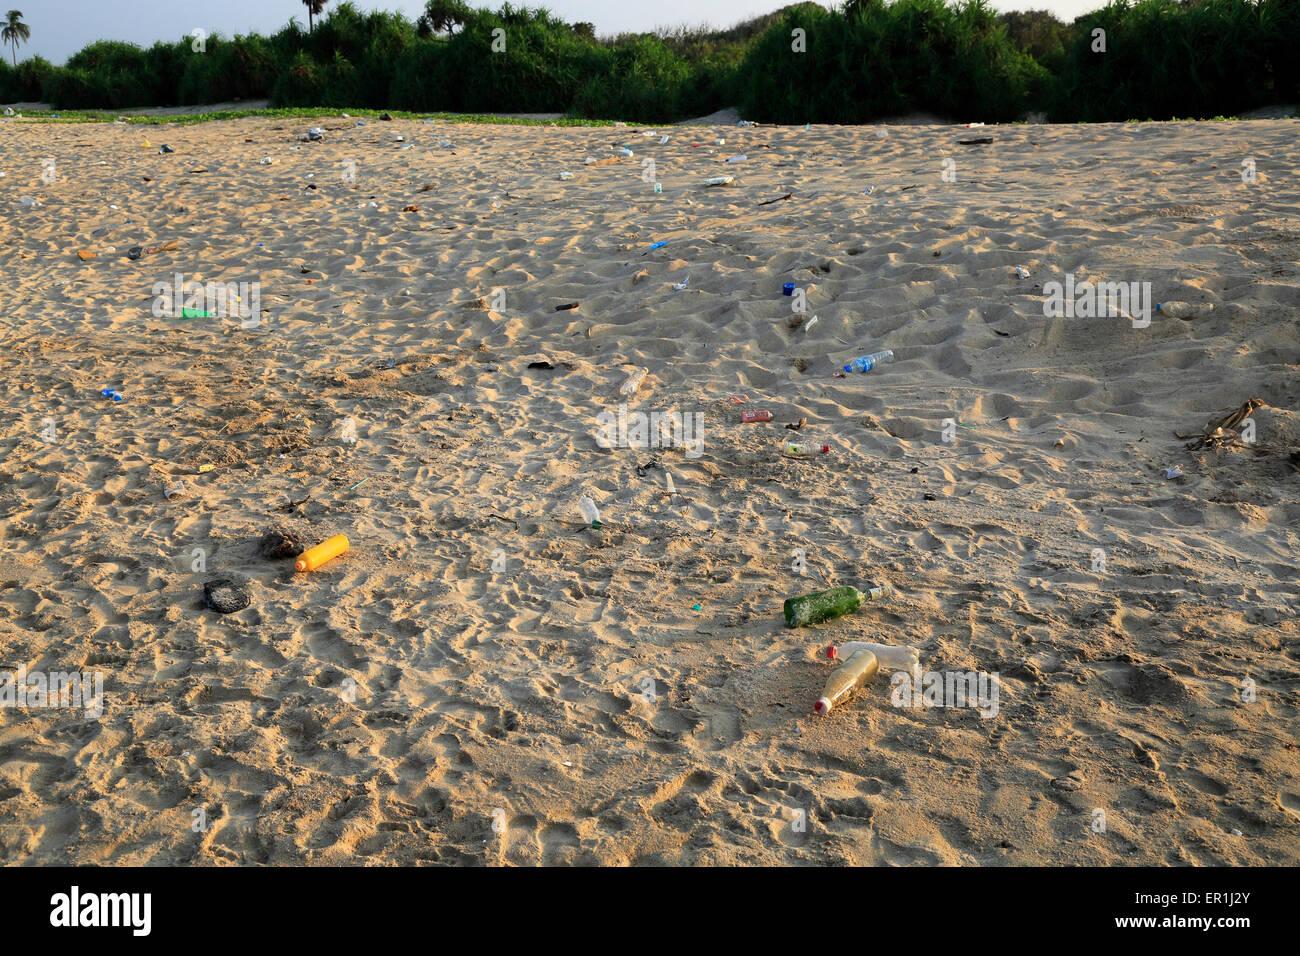 Plastic bottles litter on sandy beach, Nilavelli beach, Trincomalee, Sri Lanka, Asia - Stock Image